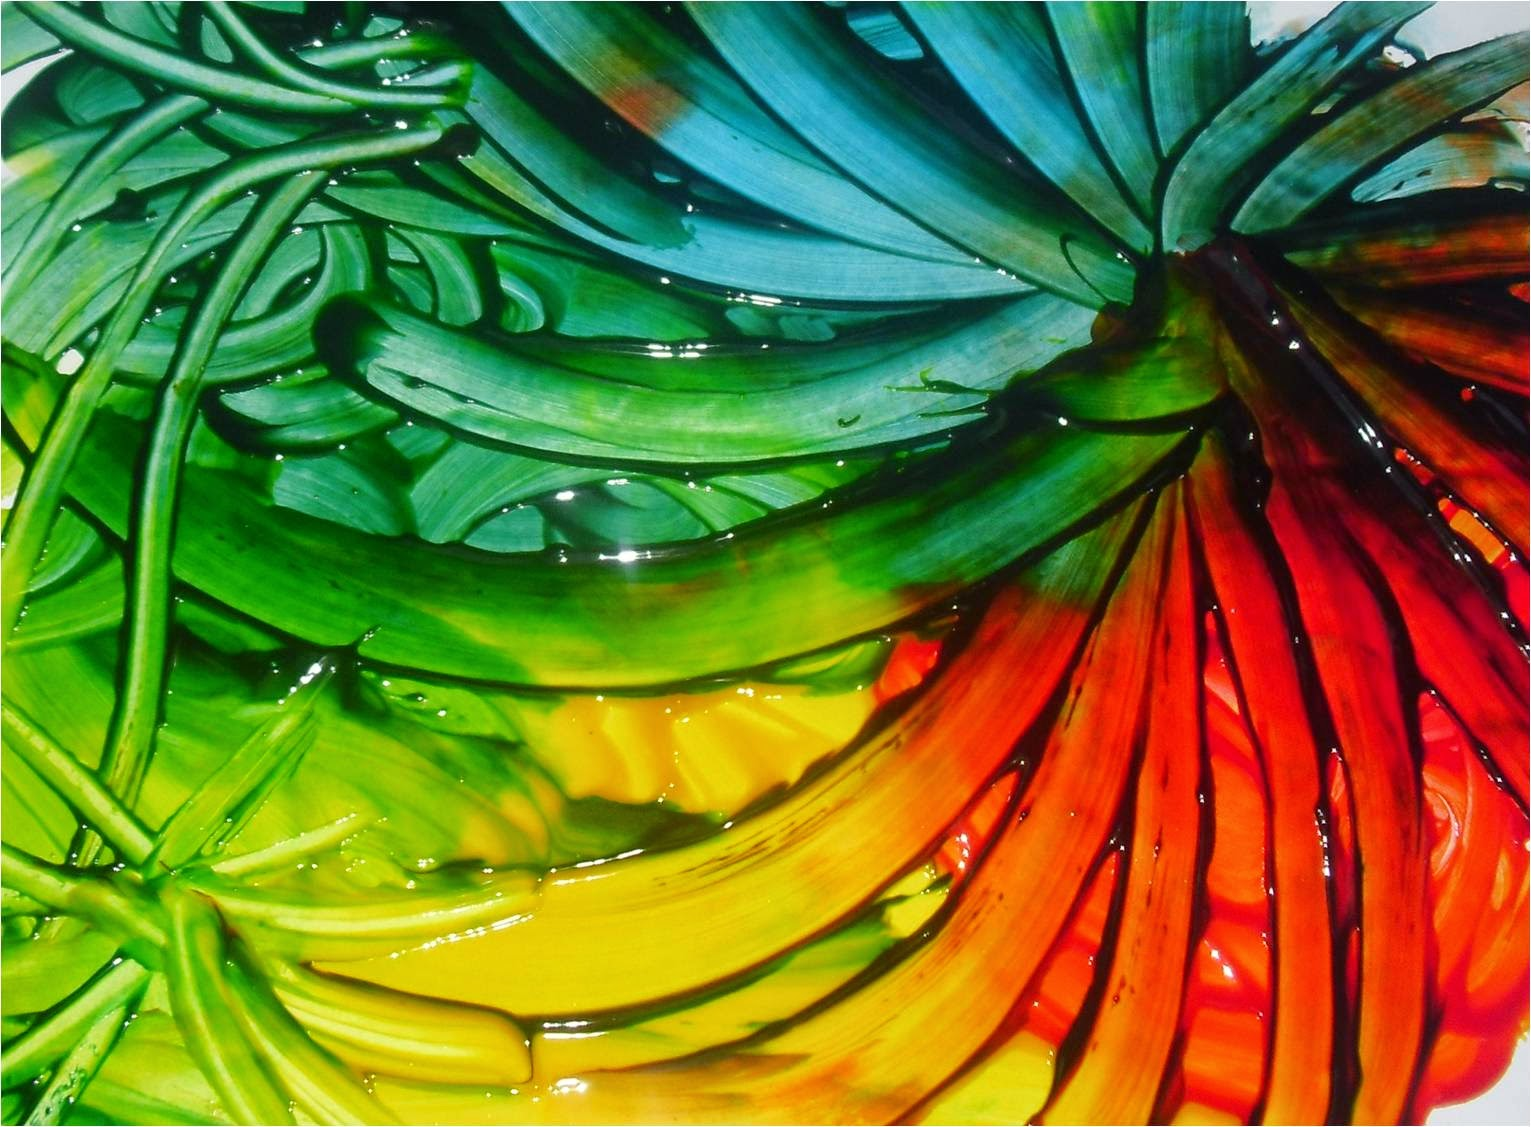 Ram Nu Masyithoh 18 Bandengan Kota Pekalongan Finger Painting